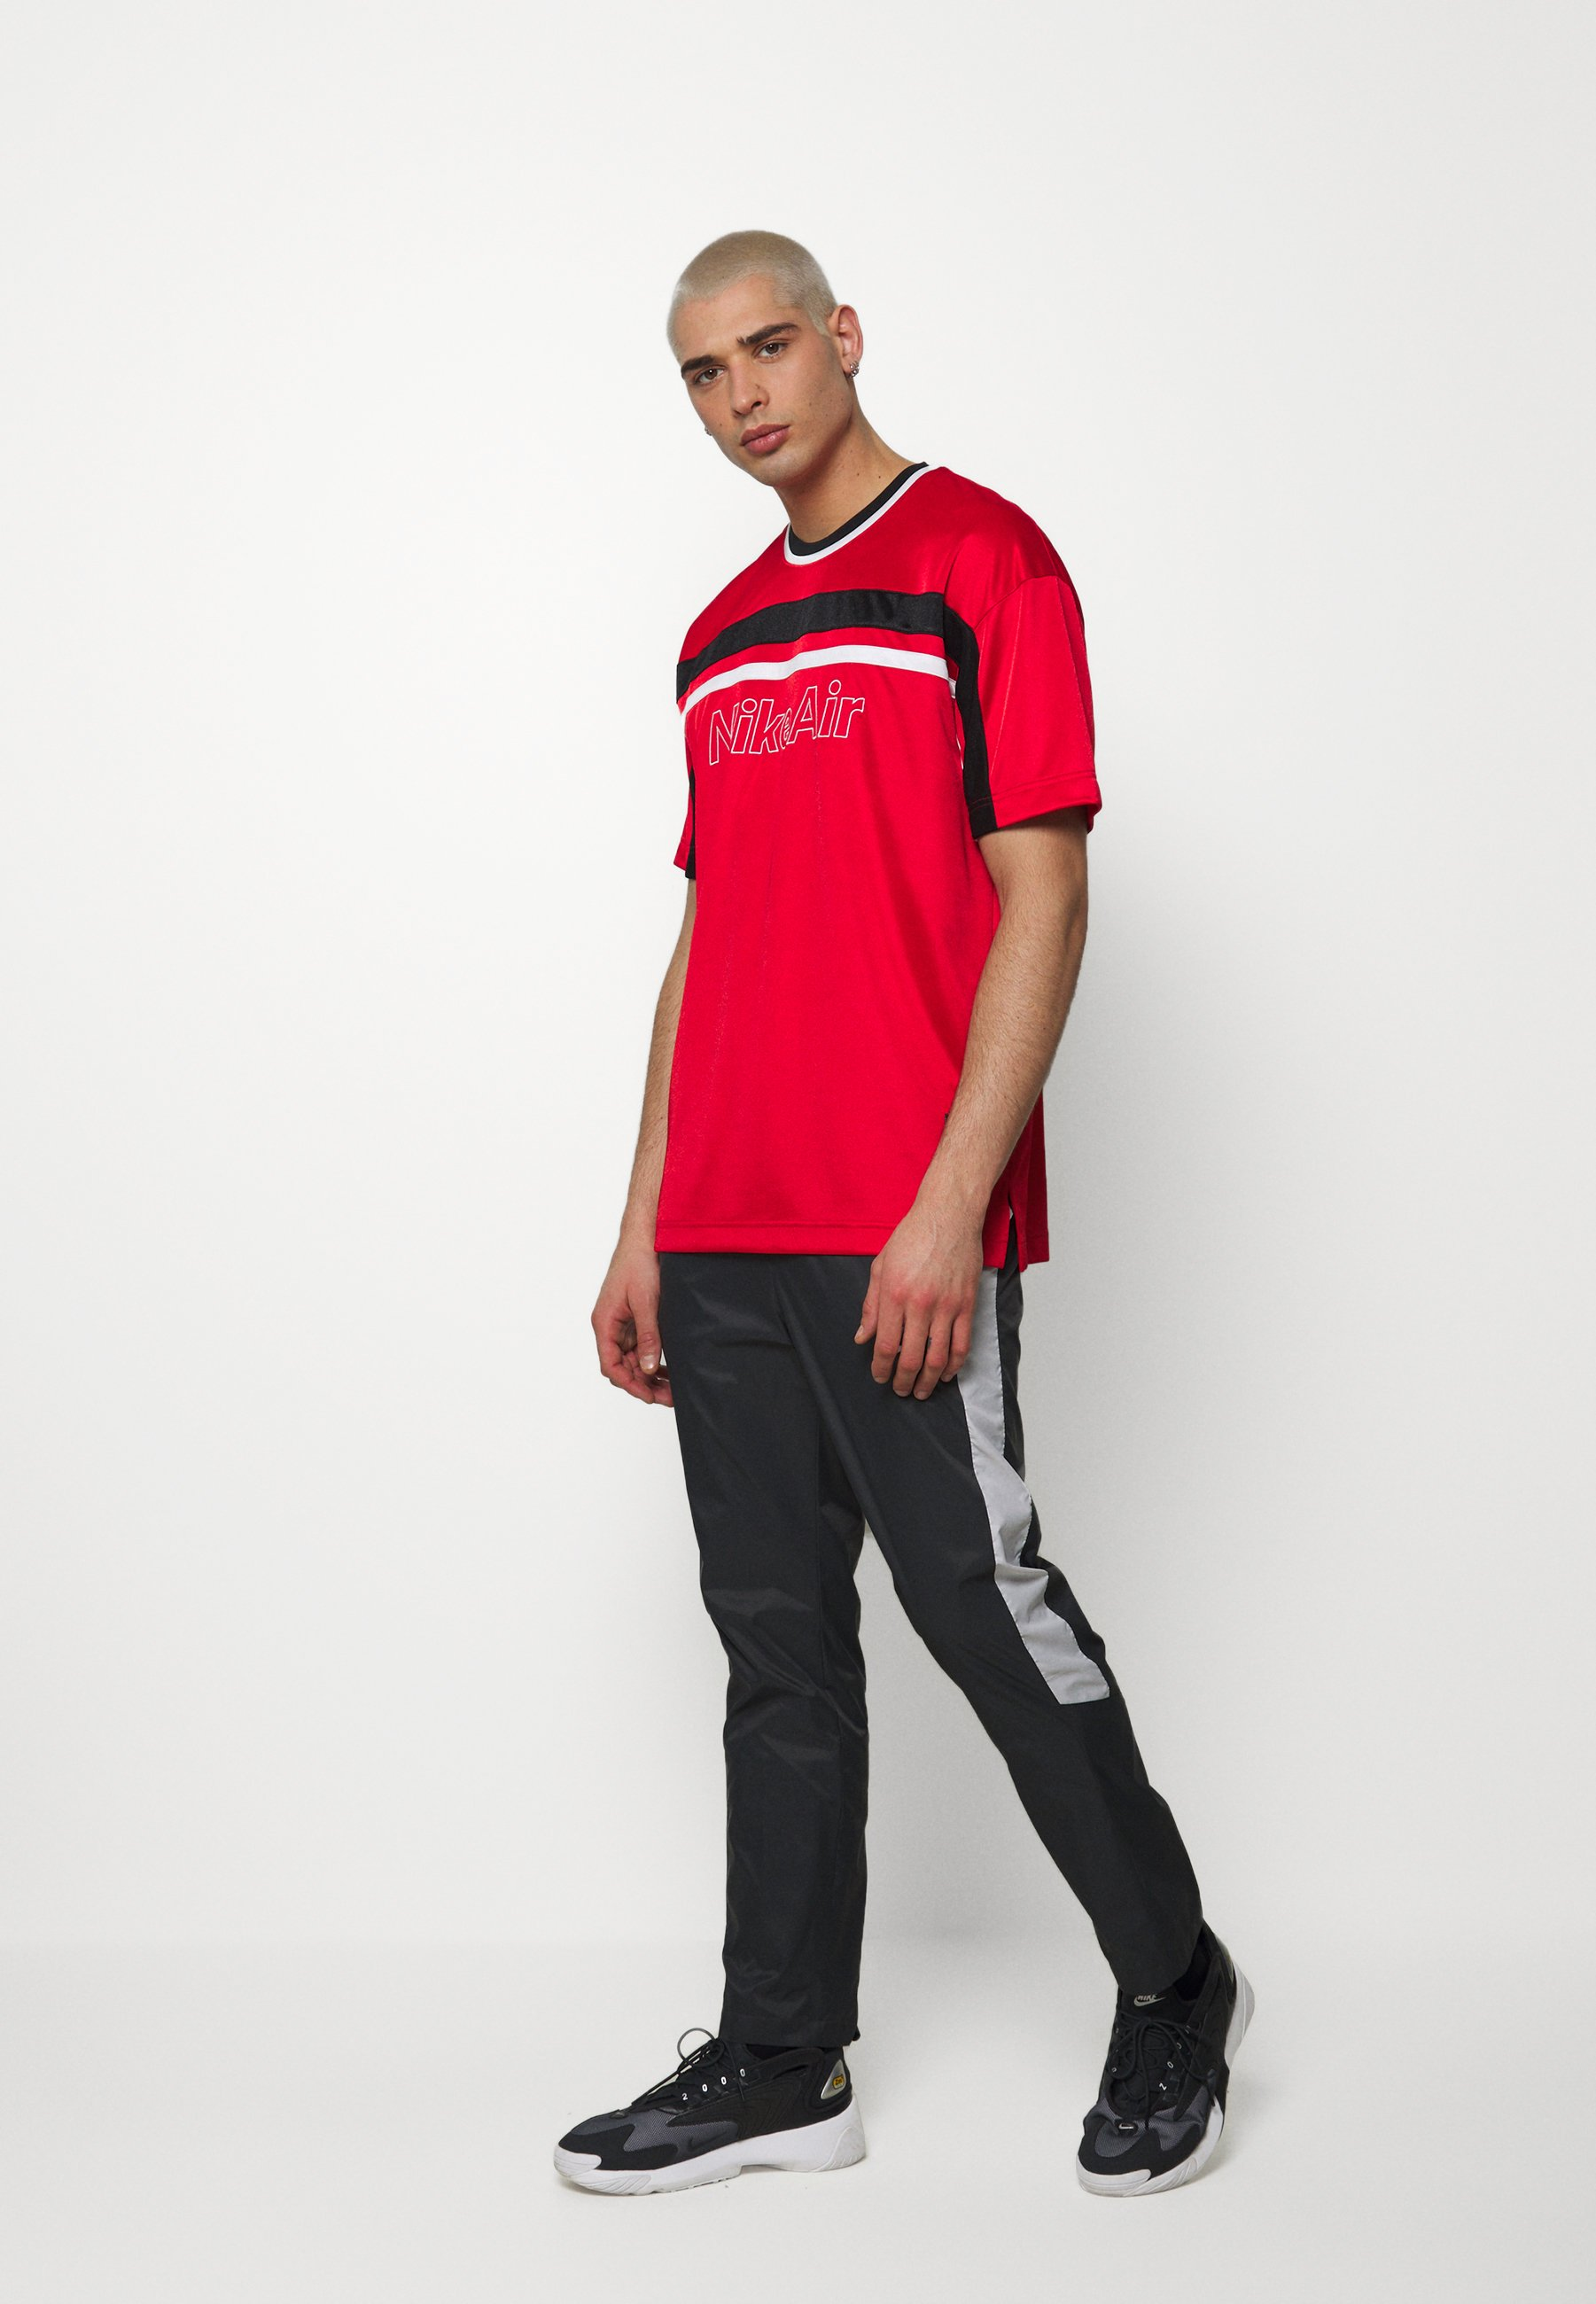 NSW NIKE AIR T shirt imprimé university redblackwhite